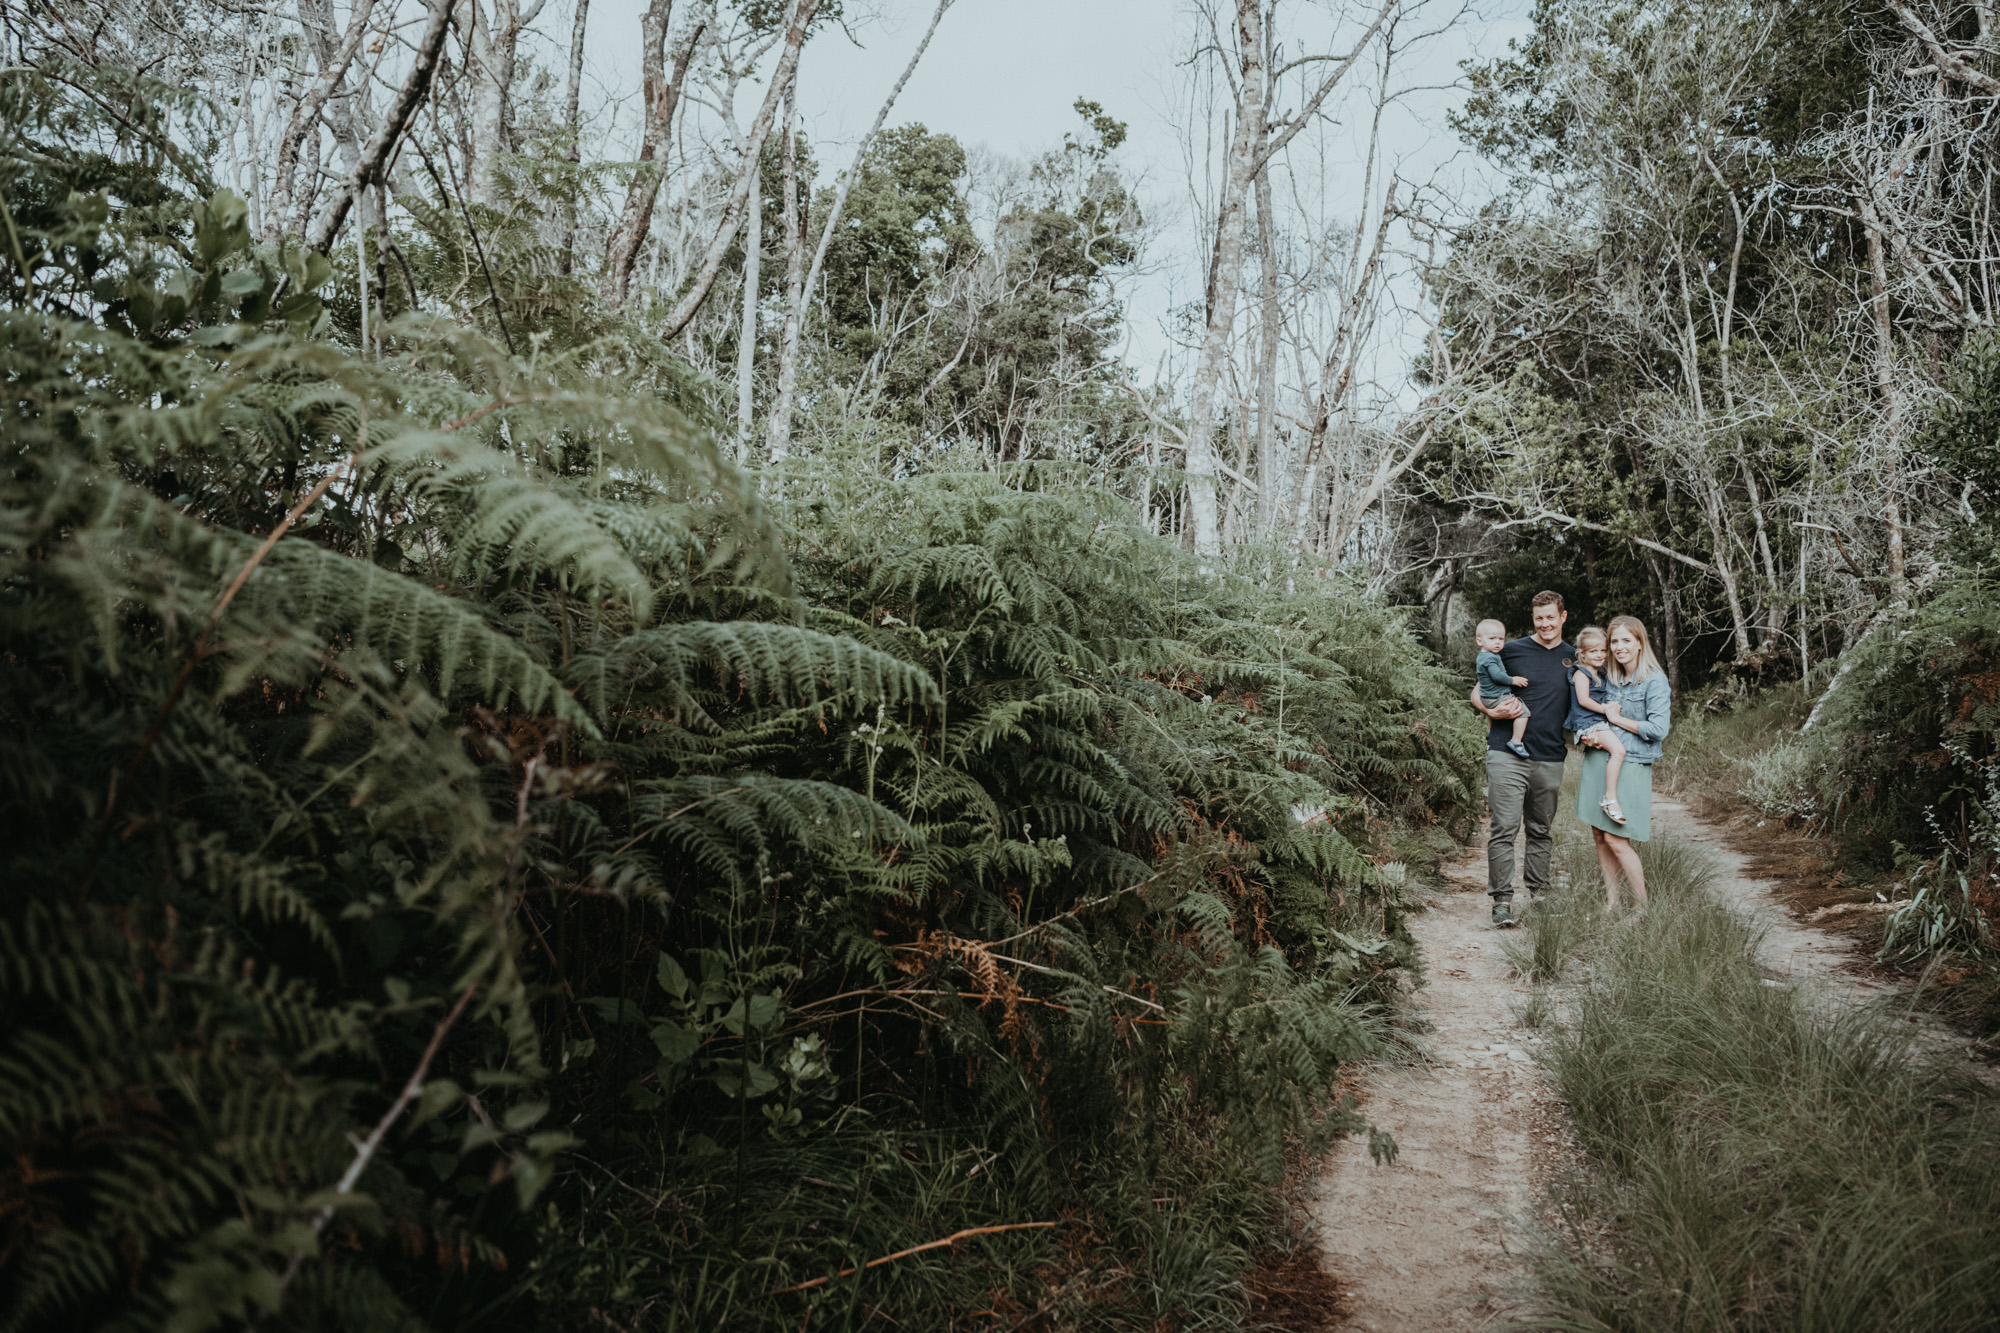 bianca-graeme-family-shoot-harkerville-sharyn-hodges-photography-167